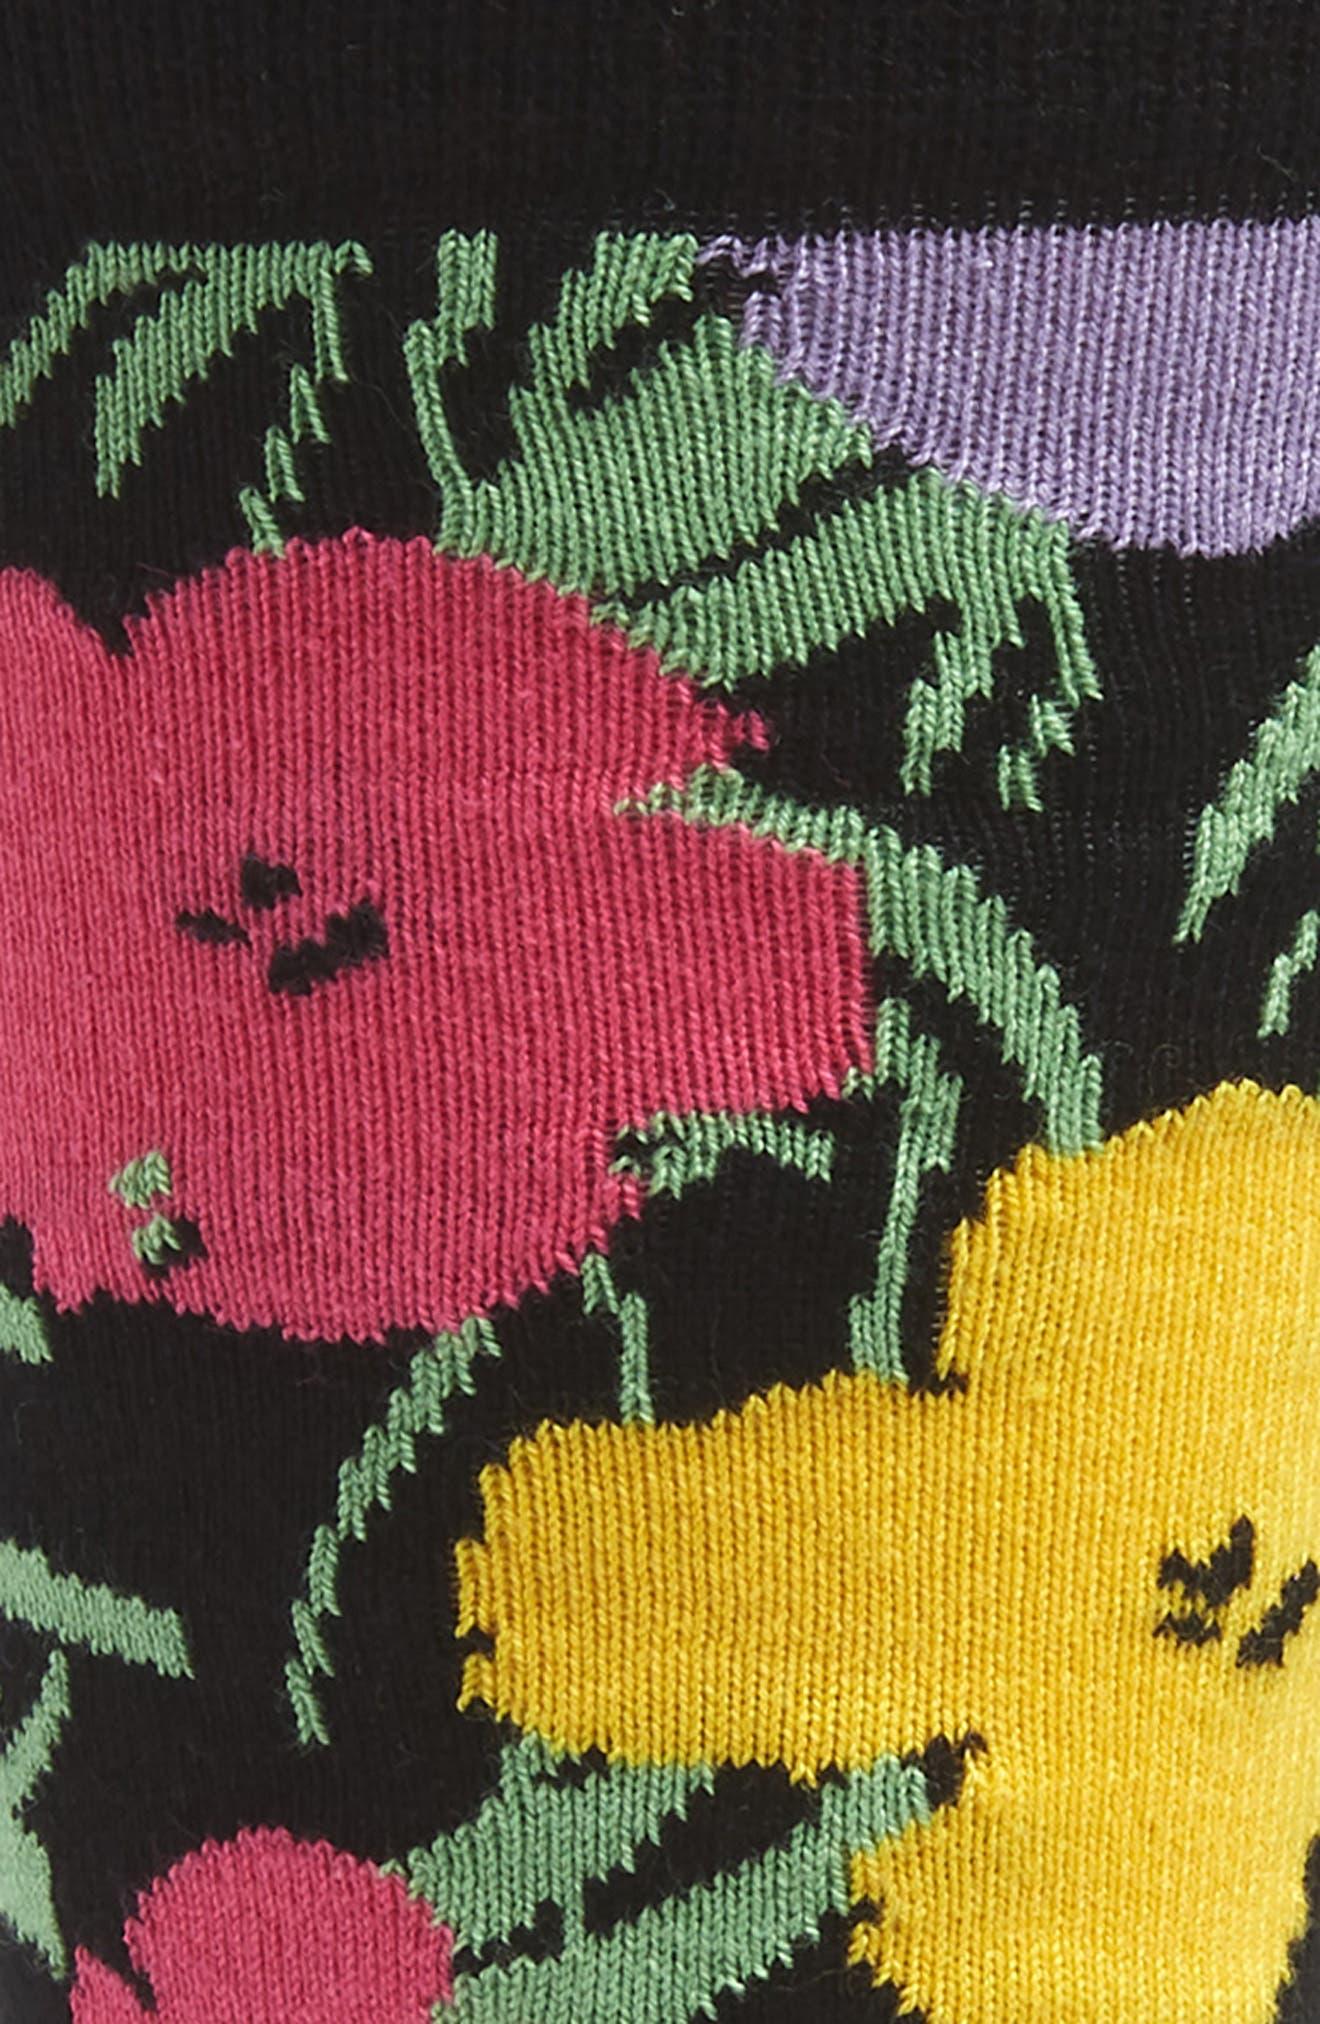 Andy Warhol Flower Socks,                             Alternate thumbnail 2, color,                             PINK